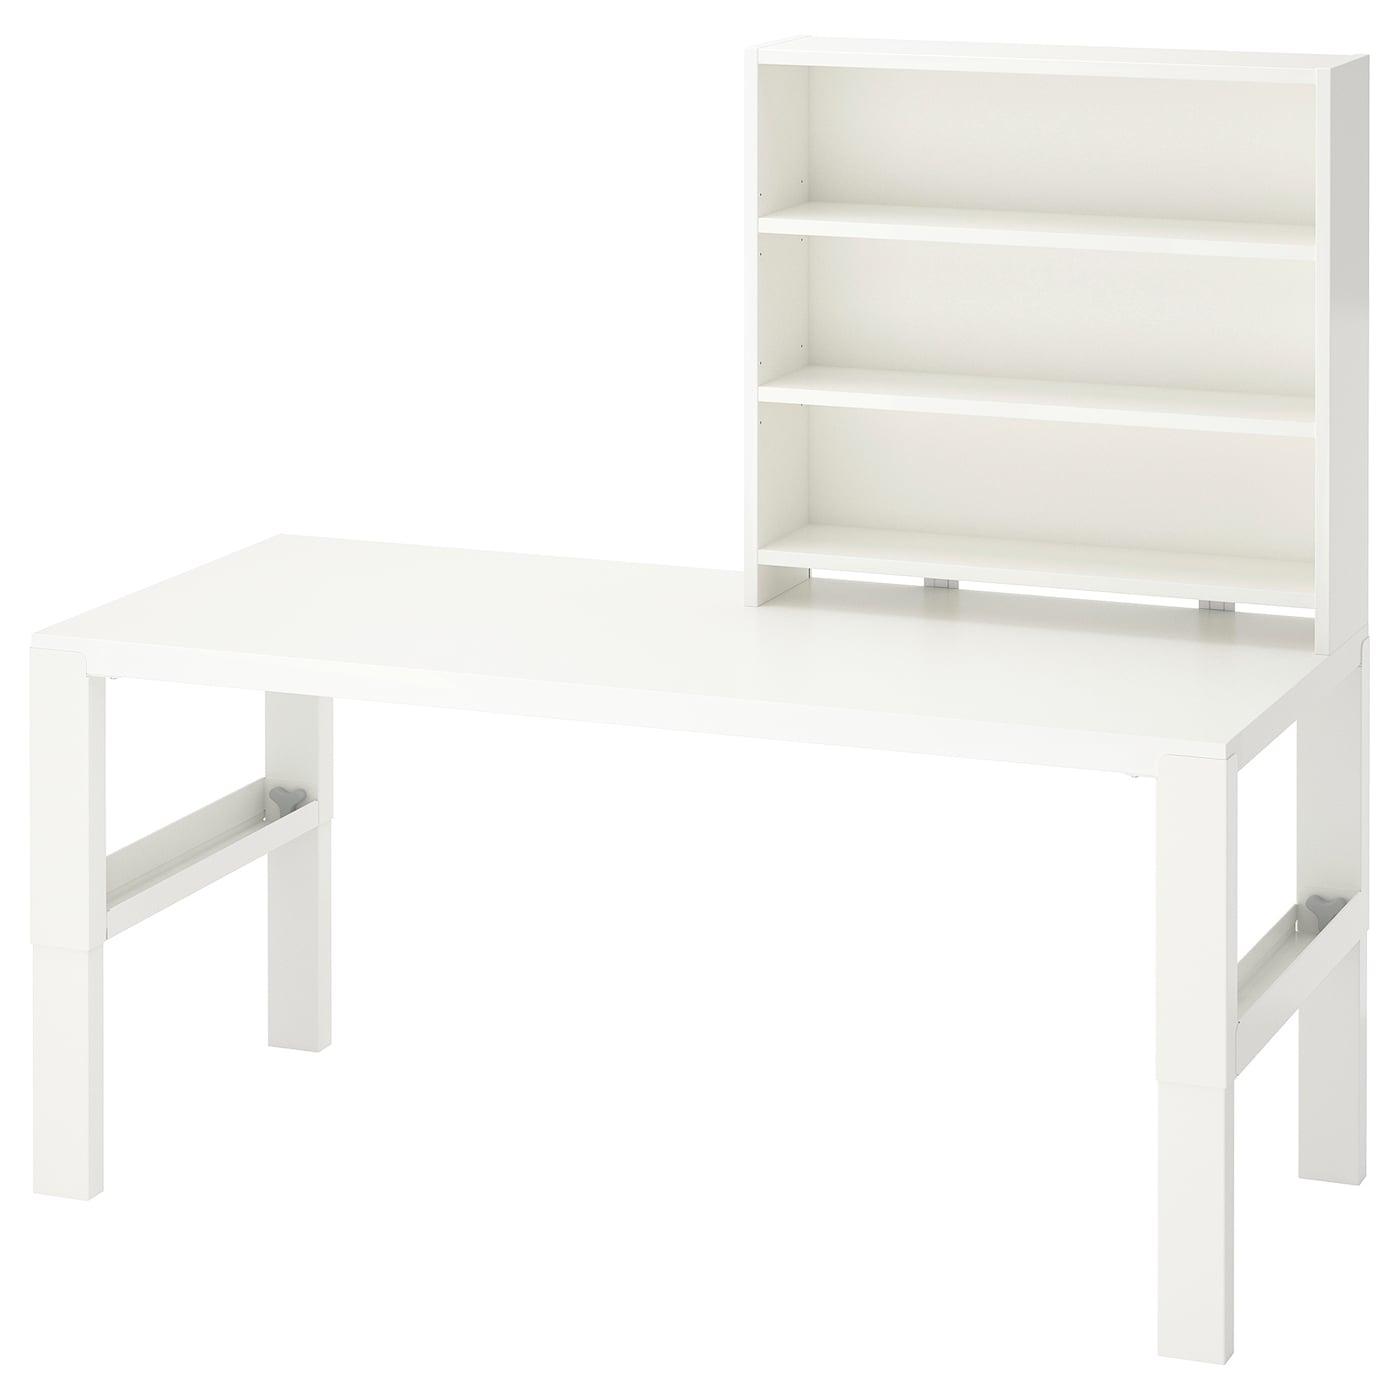 PÅHL white, Desk with shelf unit